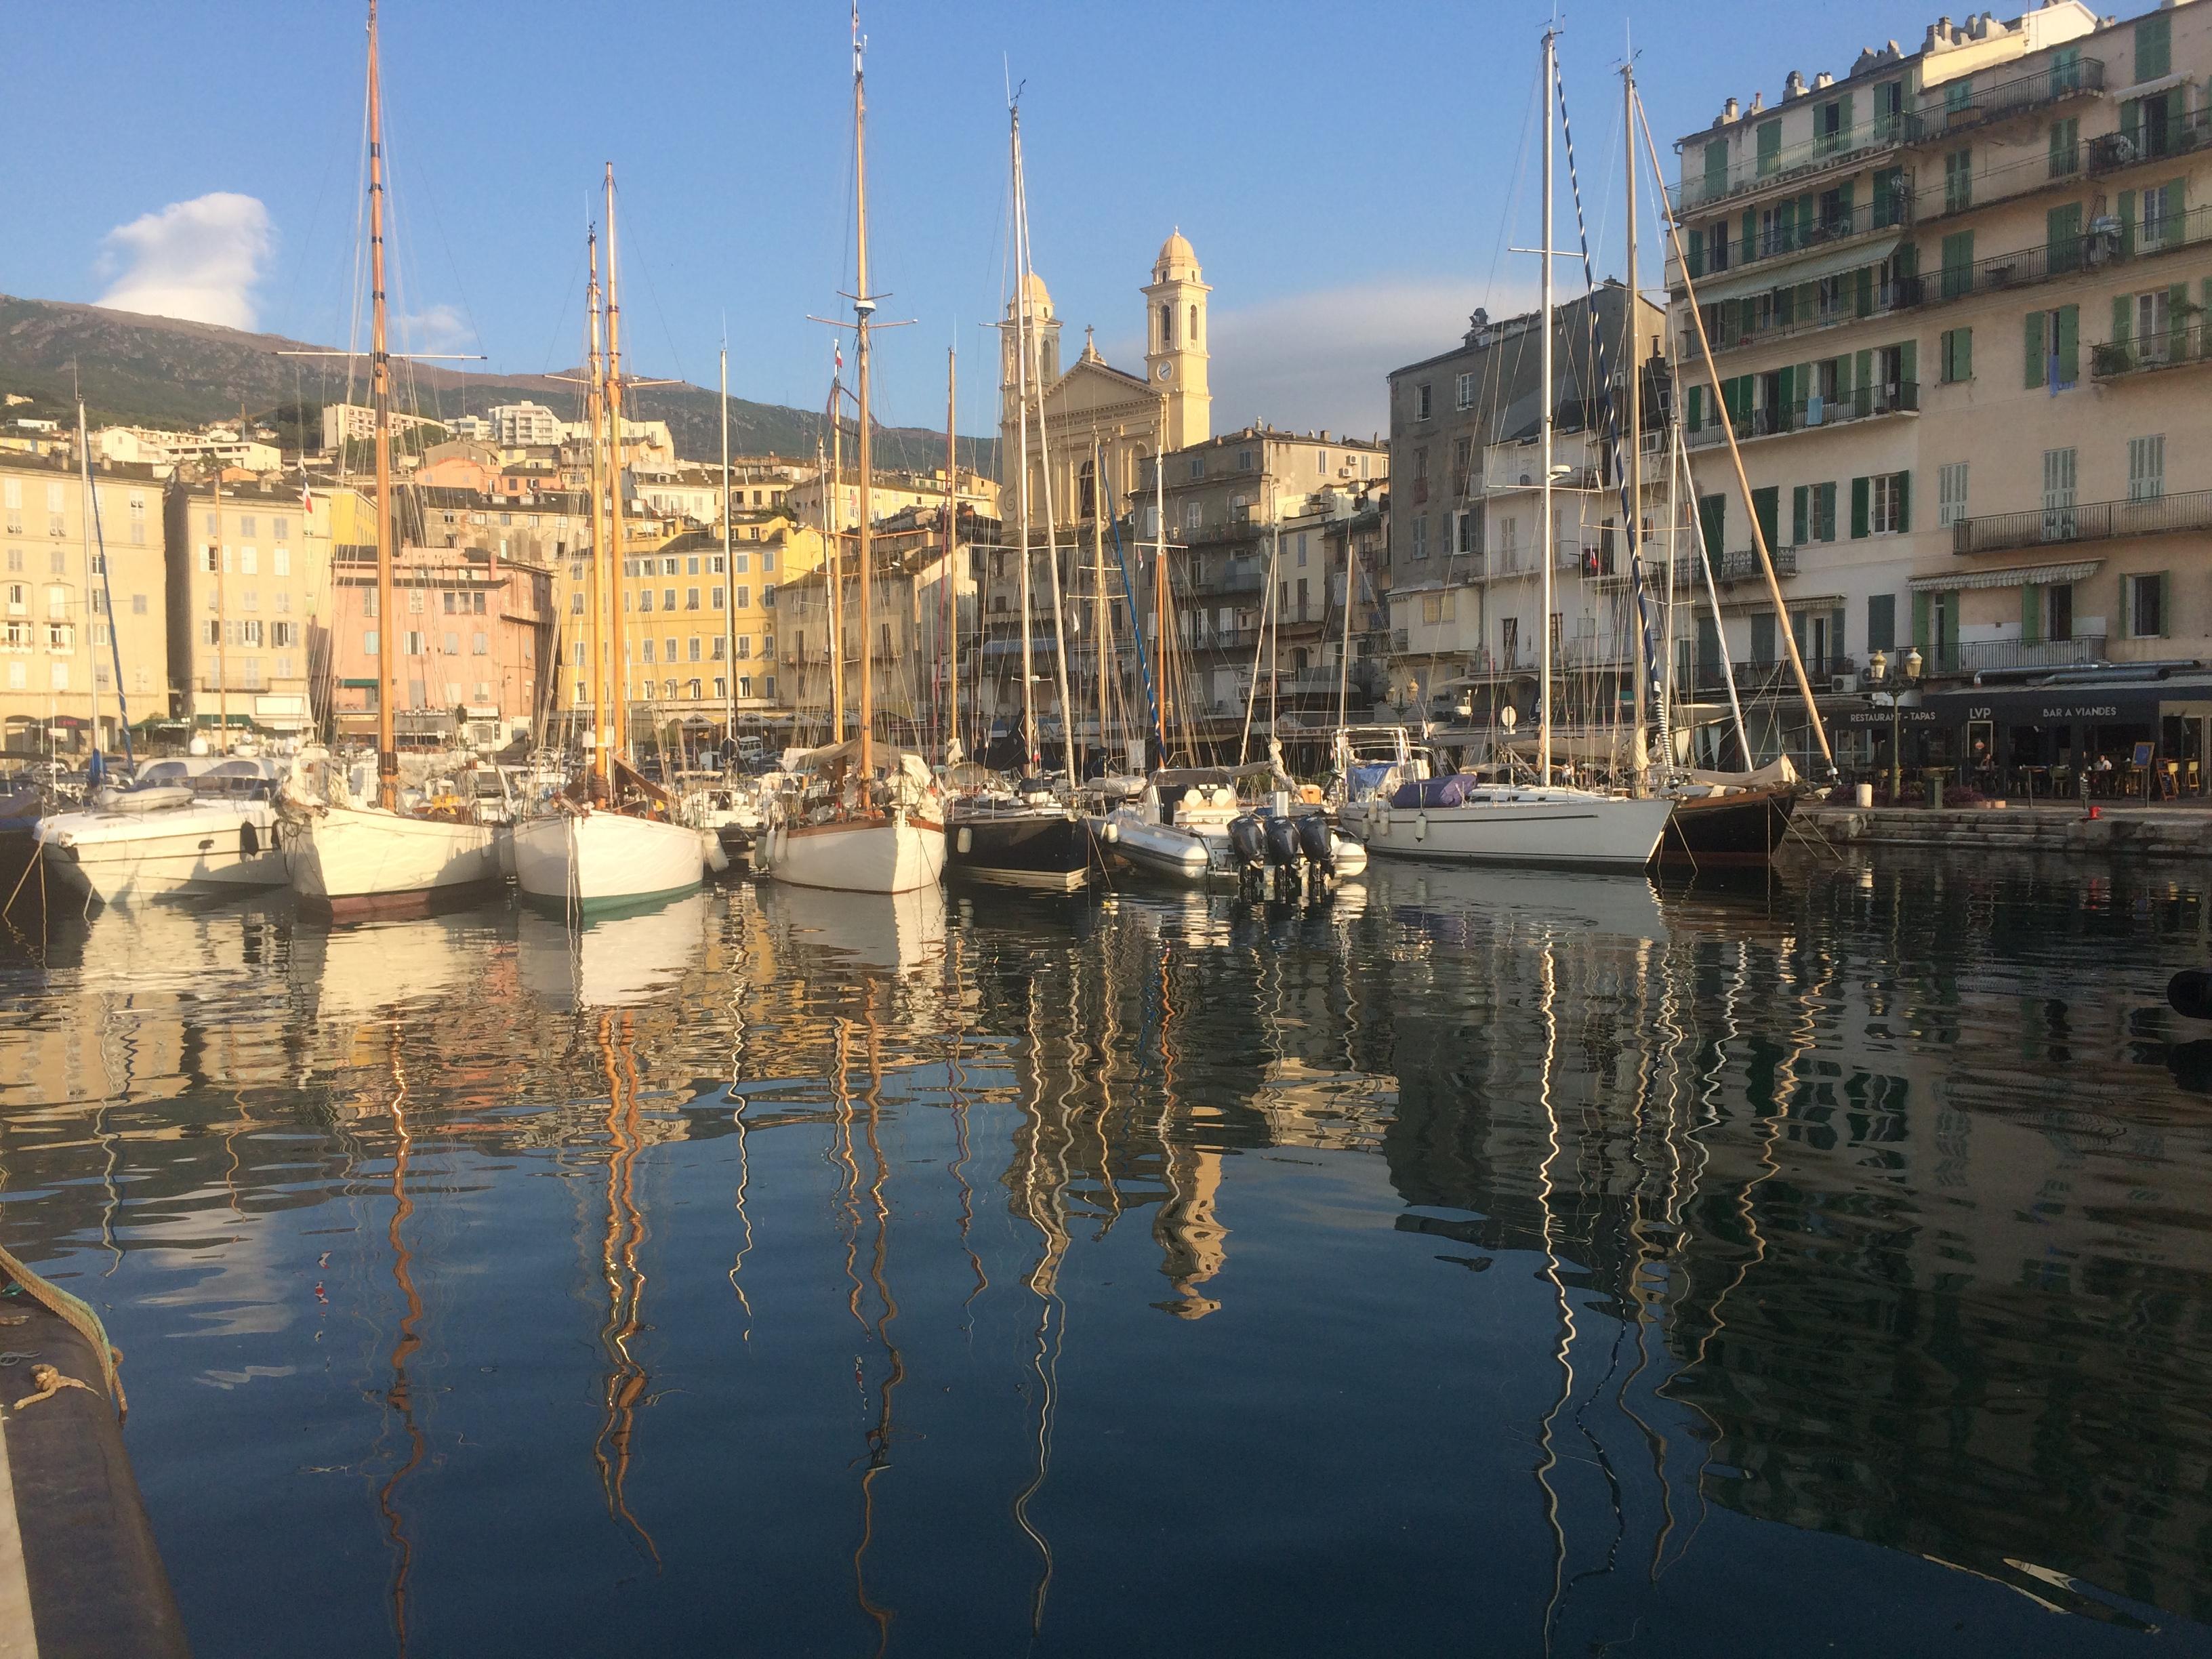 Bastia vieux port Photo Thibaud Assante